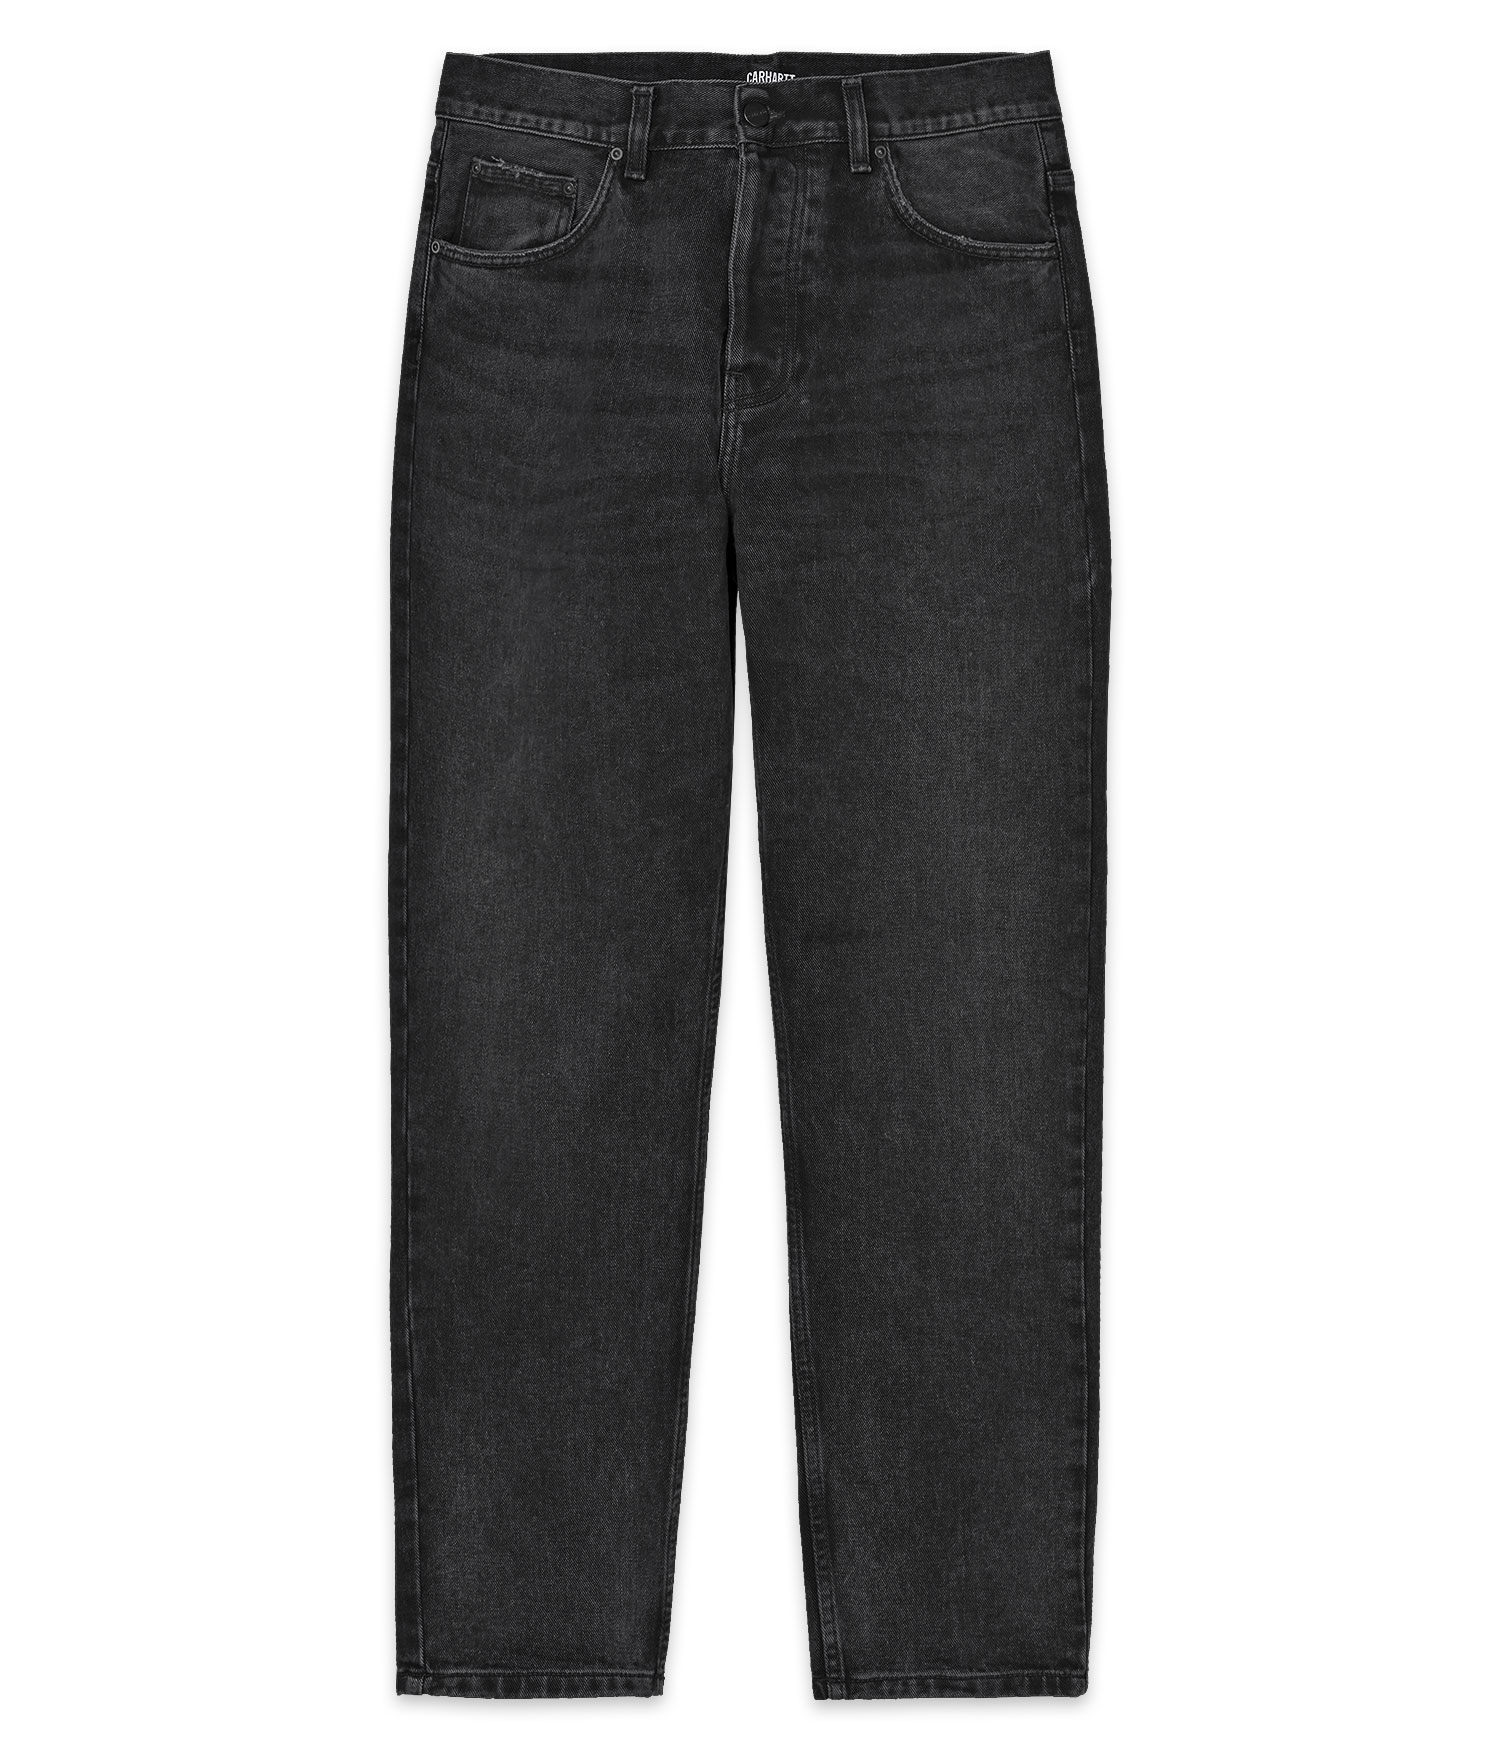 Wip Stone Newel Washed Jeansblack Maitland Carhartt Pant Yygv76Ibf